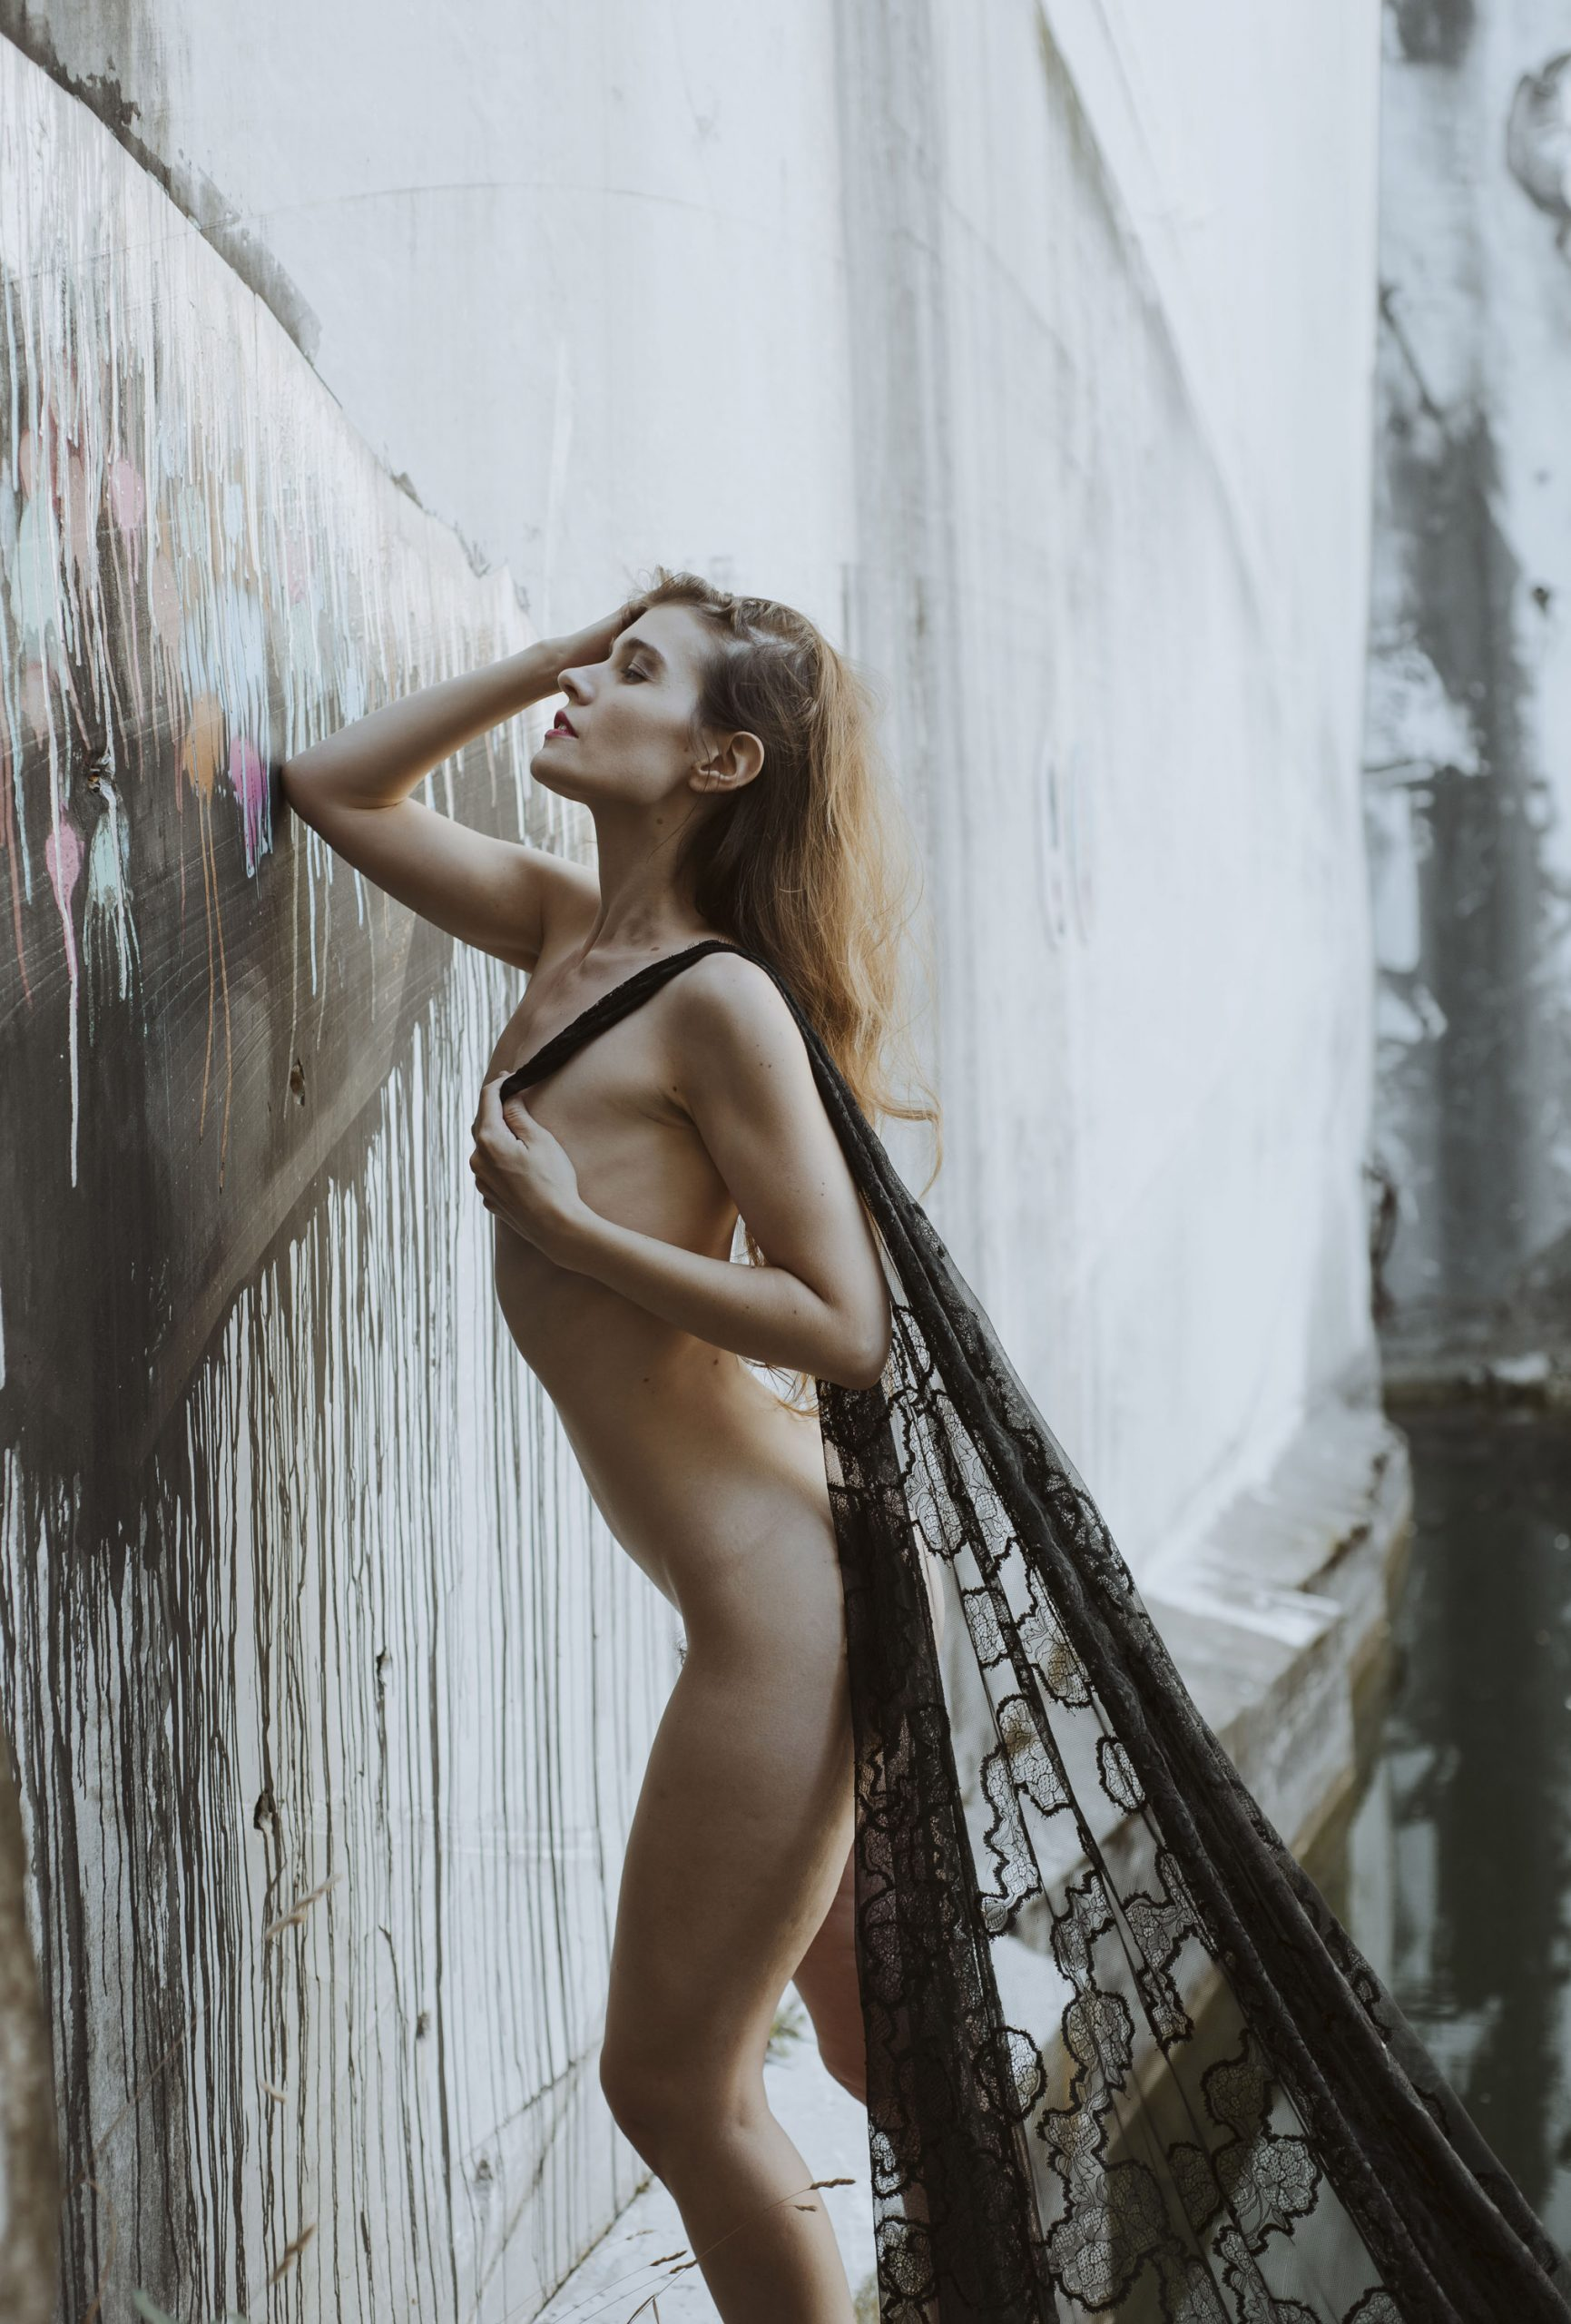 Categorie: Boudoir & Nude, Glamour, Portrait; Photographer: AURORA LIPERINI; Model: ELISA PAGANO; Location: Lucca, LU, Italia